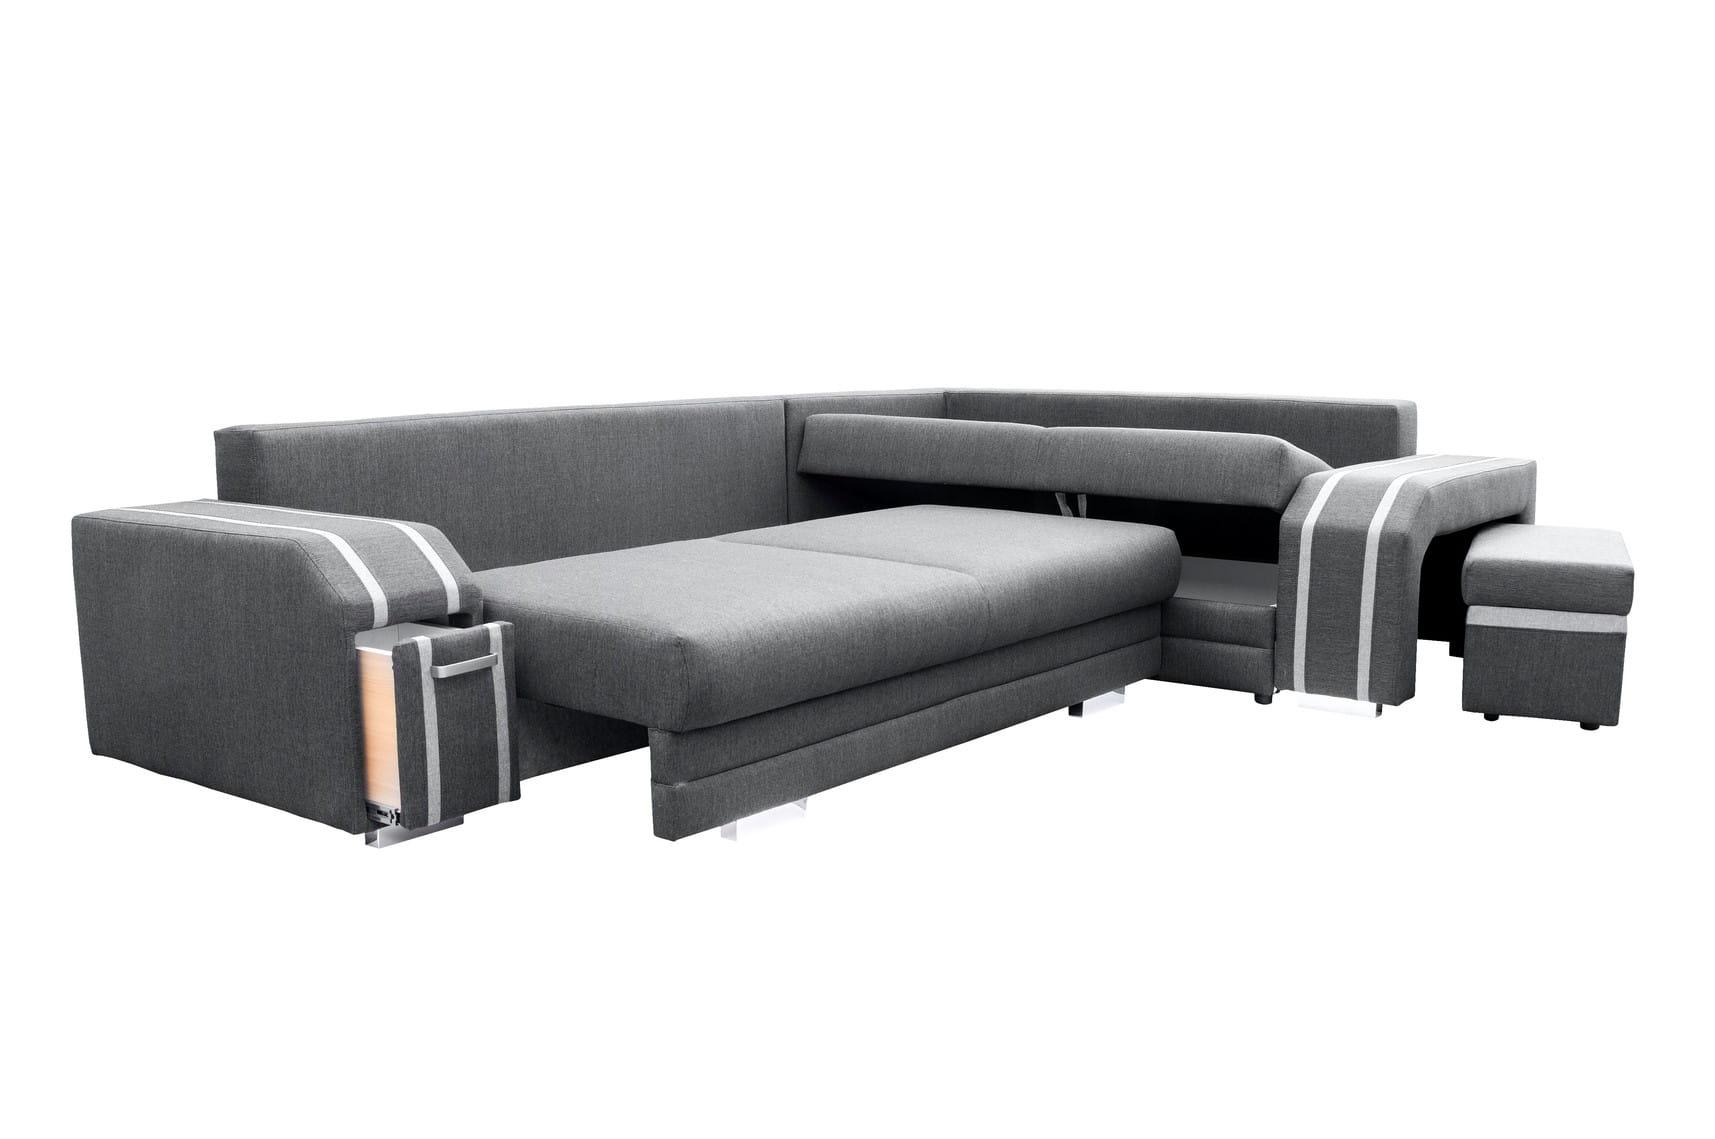 wohnlandschaft eckgarnitur sofa andreas mit schlaffunktion. Black Bedroom Furniture Sets. Home Design Ideas